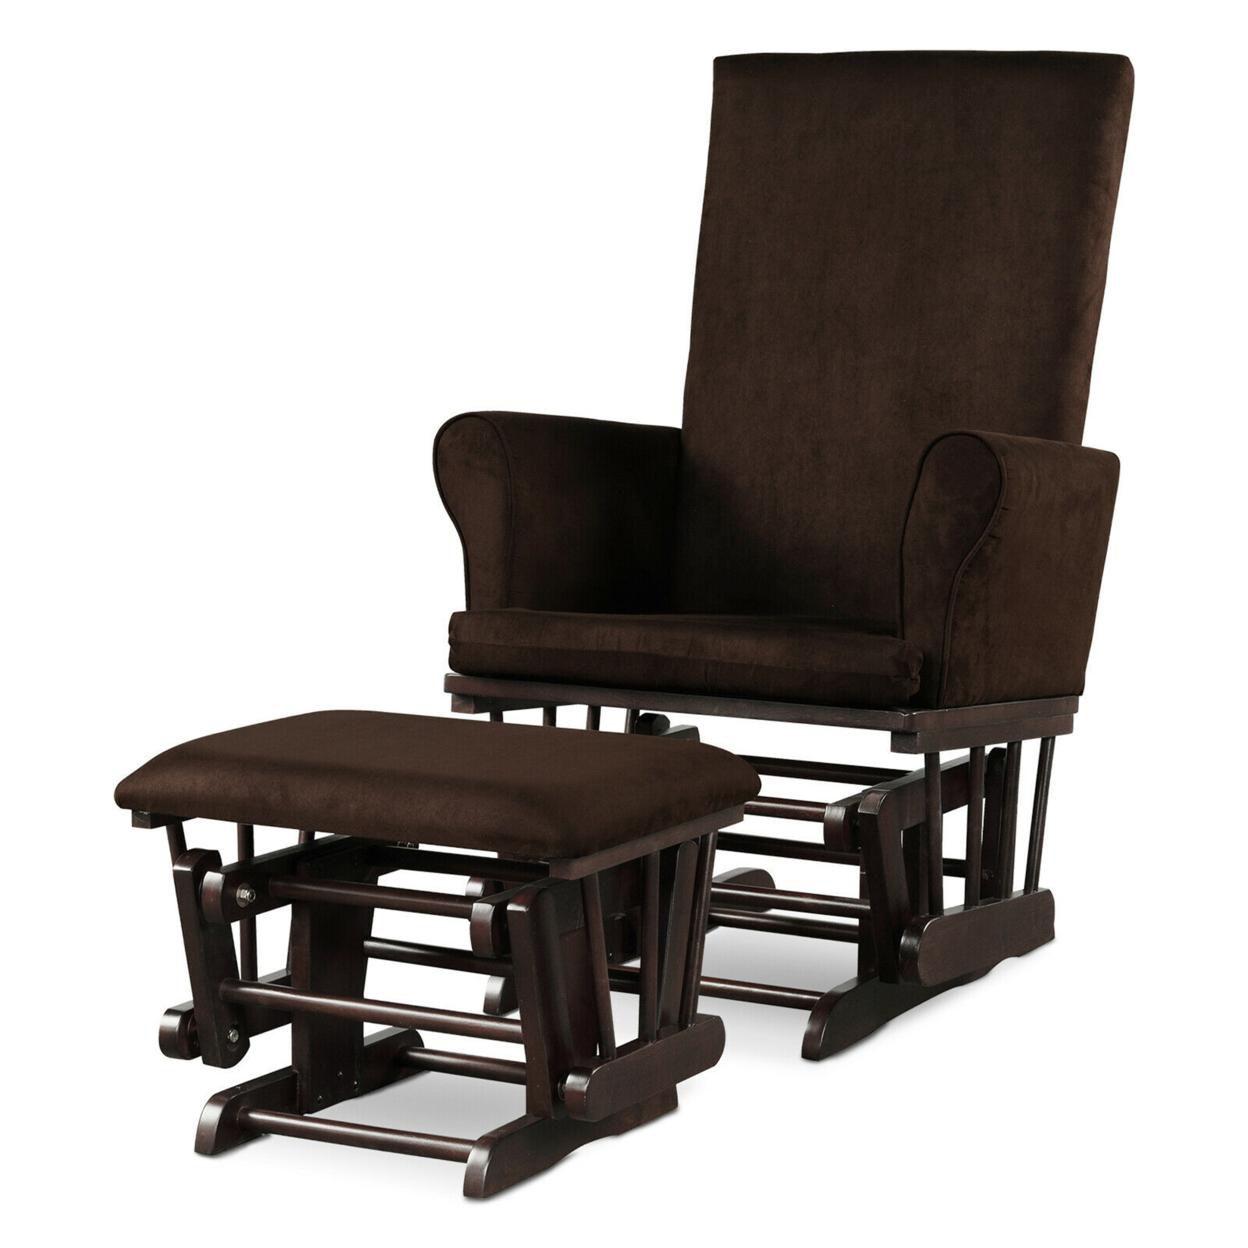 Gymax Glider and Ottoman Cushion Set Wooden Baby Nursery Rocking Chair